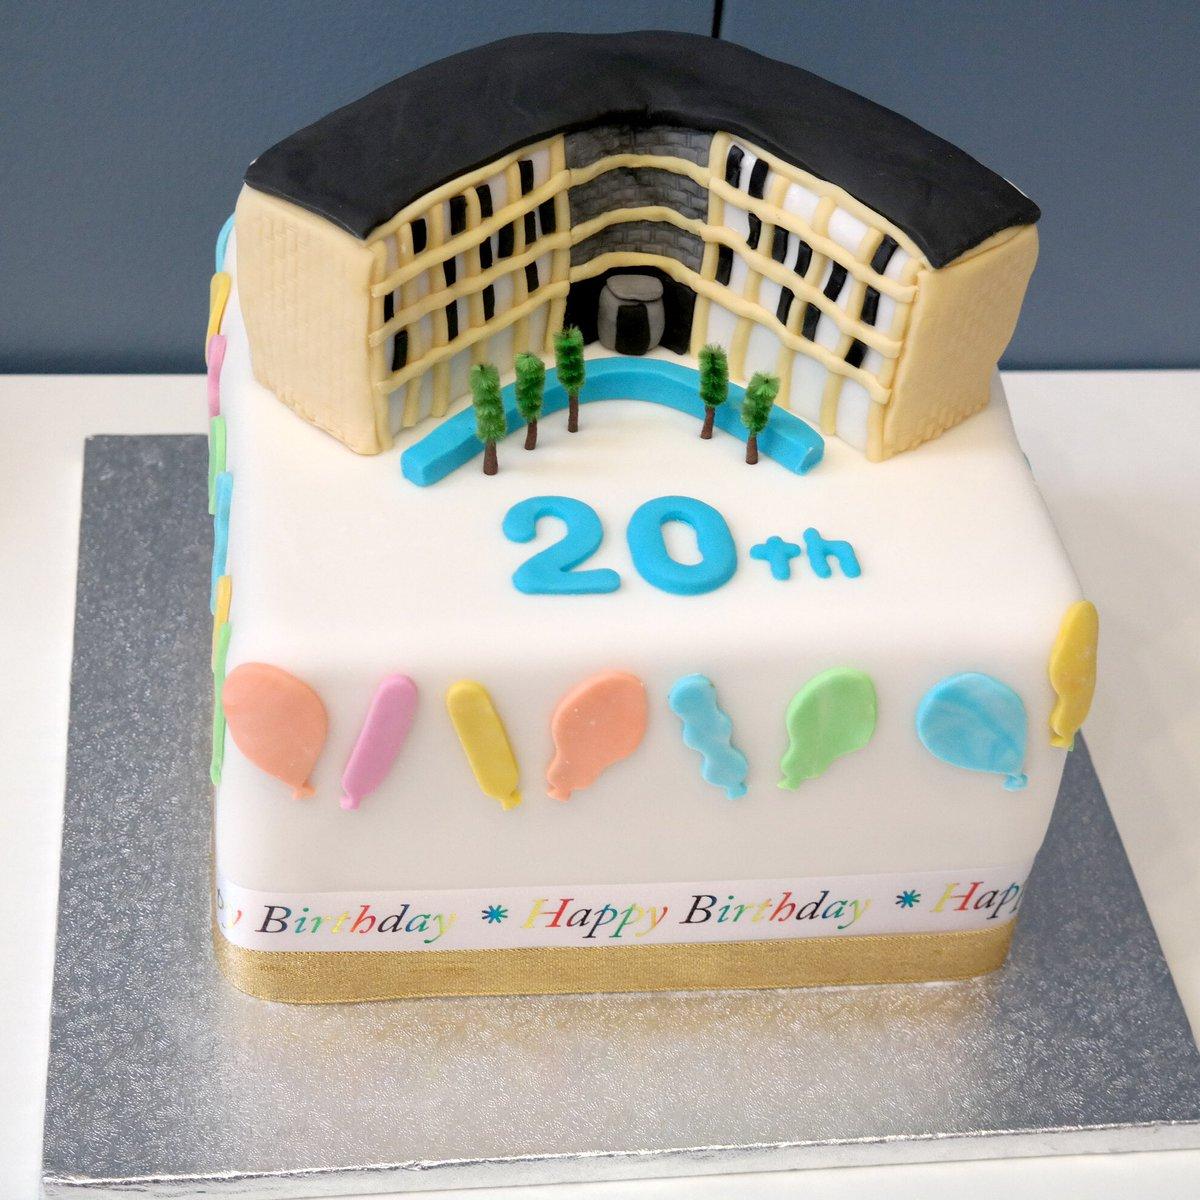 I Got To Cut The Birthday Cake Great Science Community Happy Pictwitter PTQFOMiZPk